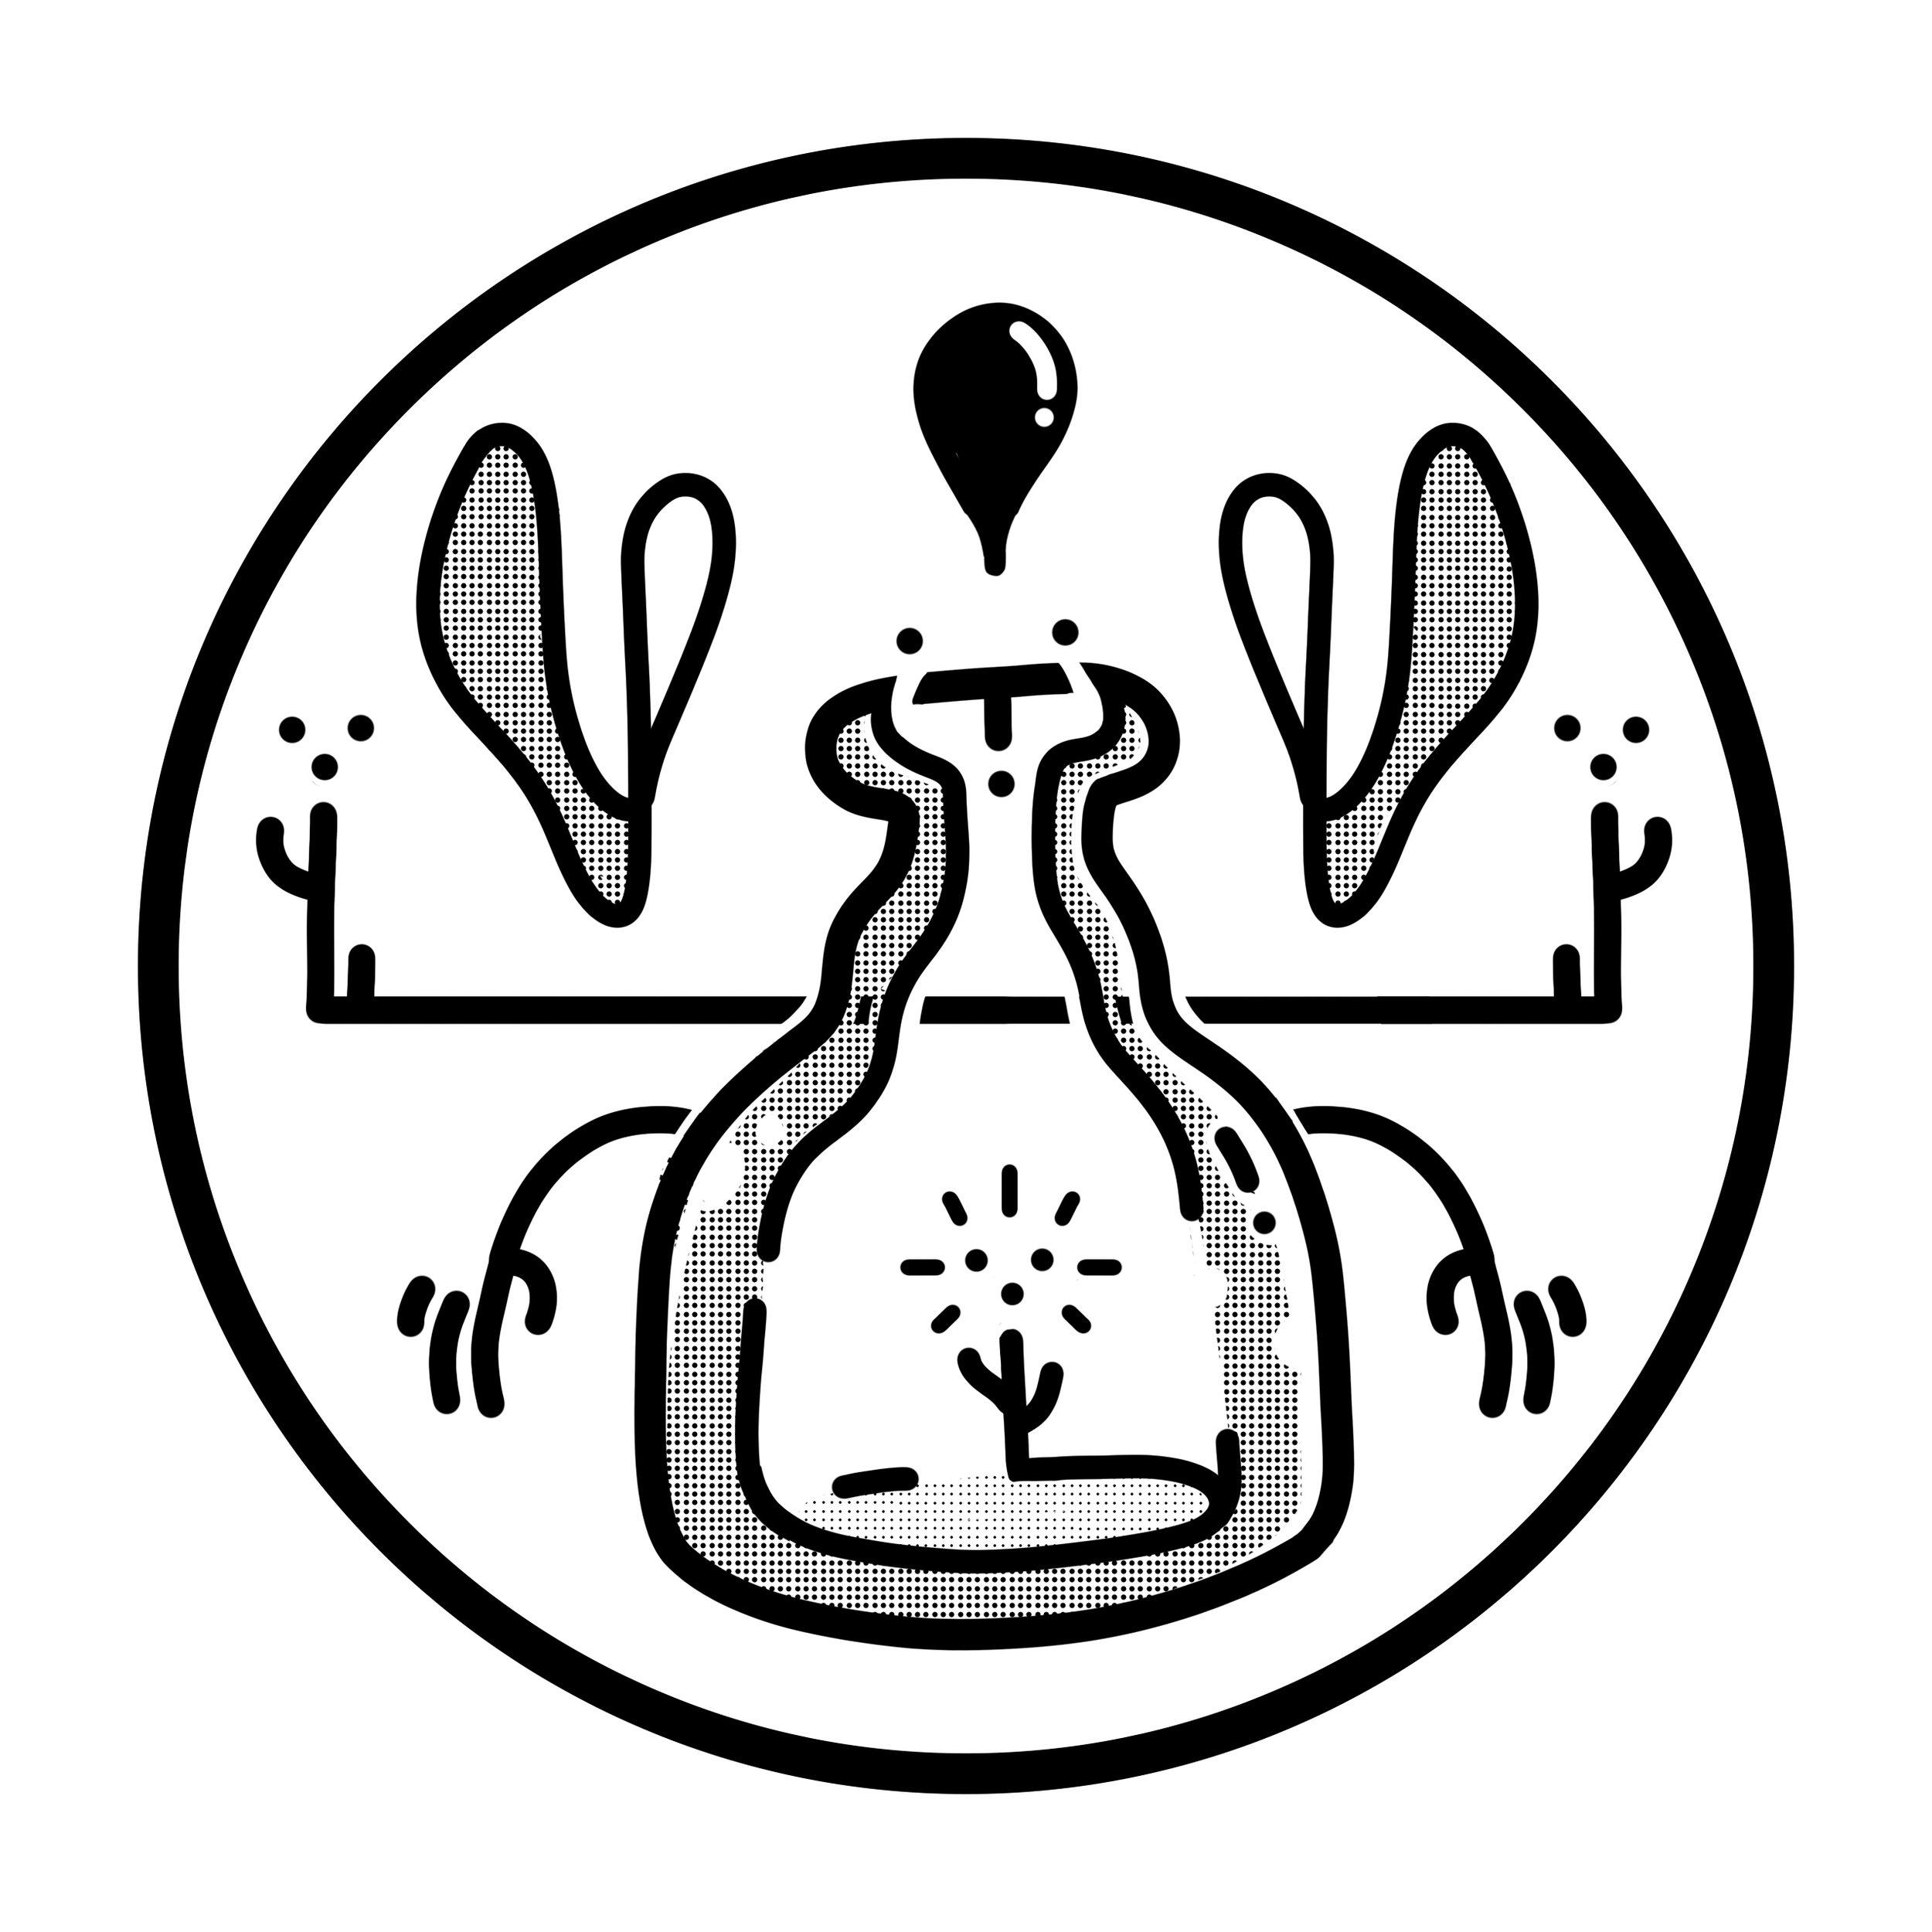 logo_icon_bw.jpg